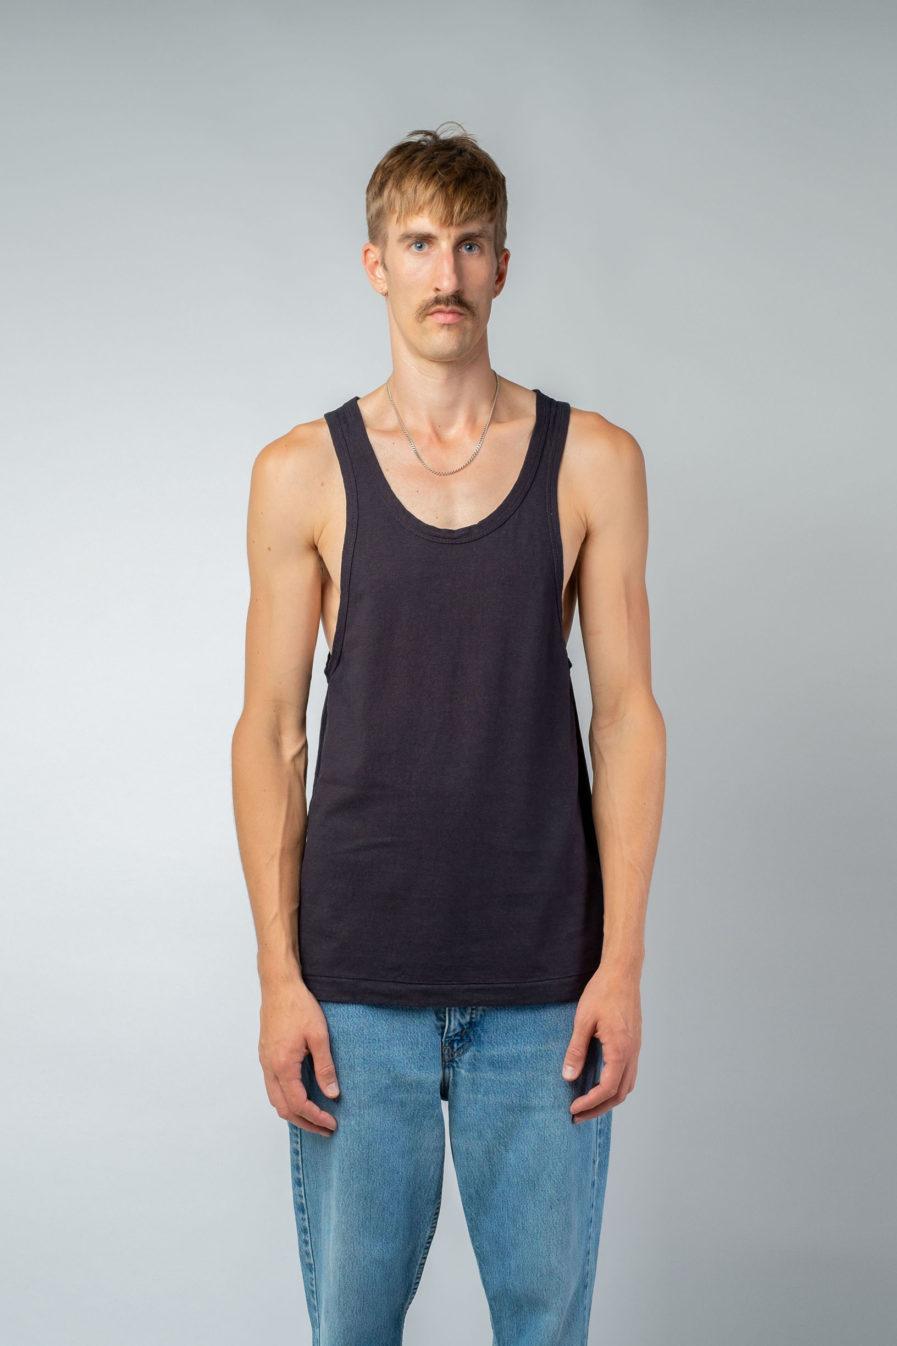 MAN unisex singlet tanktop hemp organic cotton LAU Carbon black front